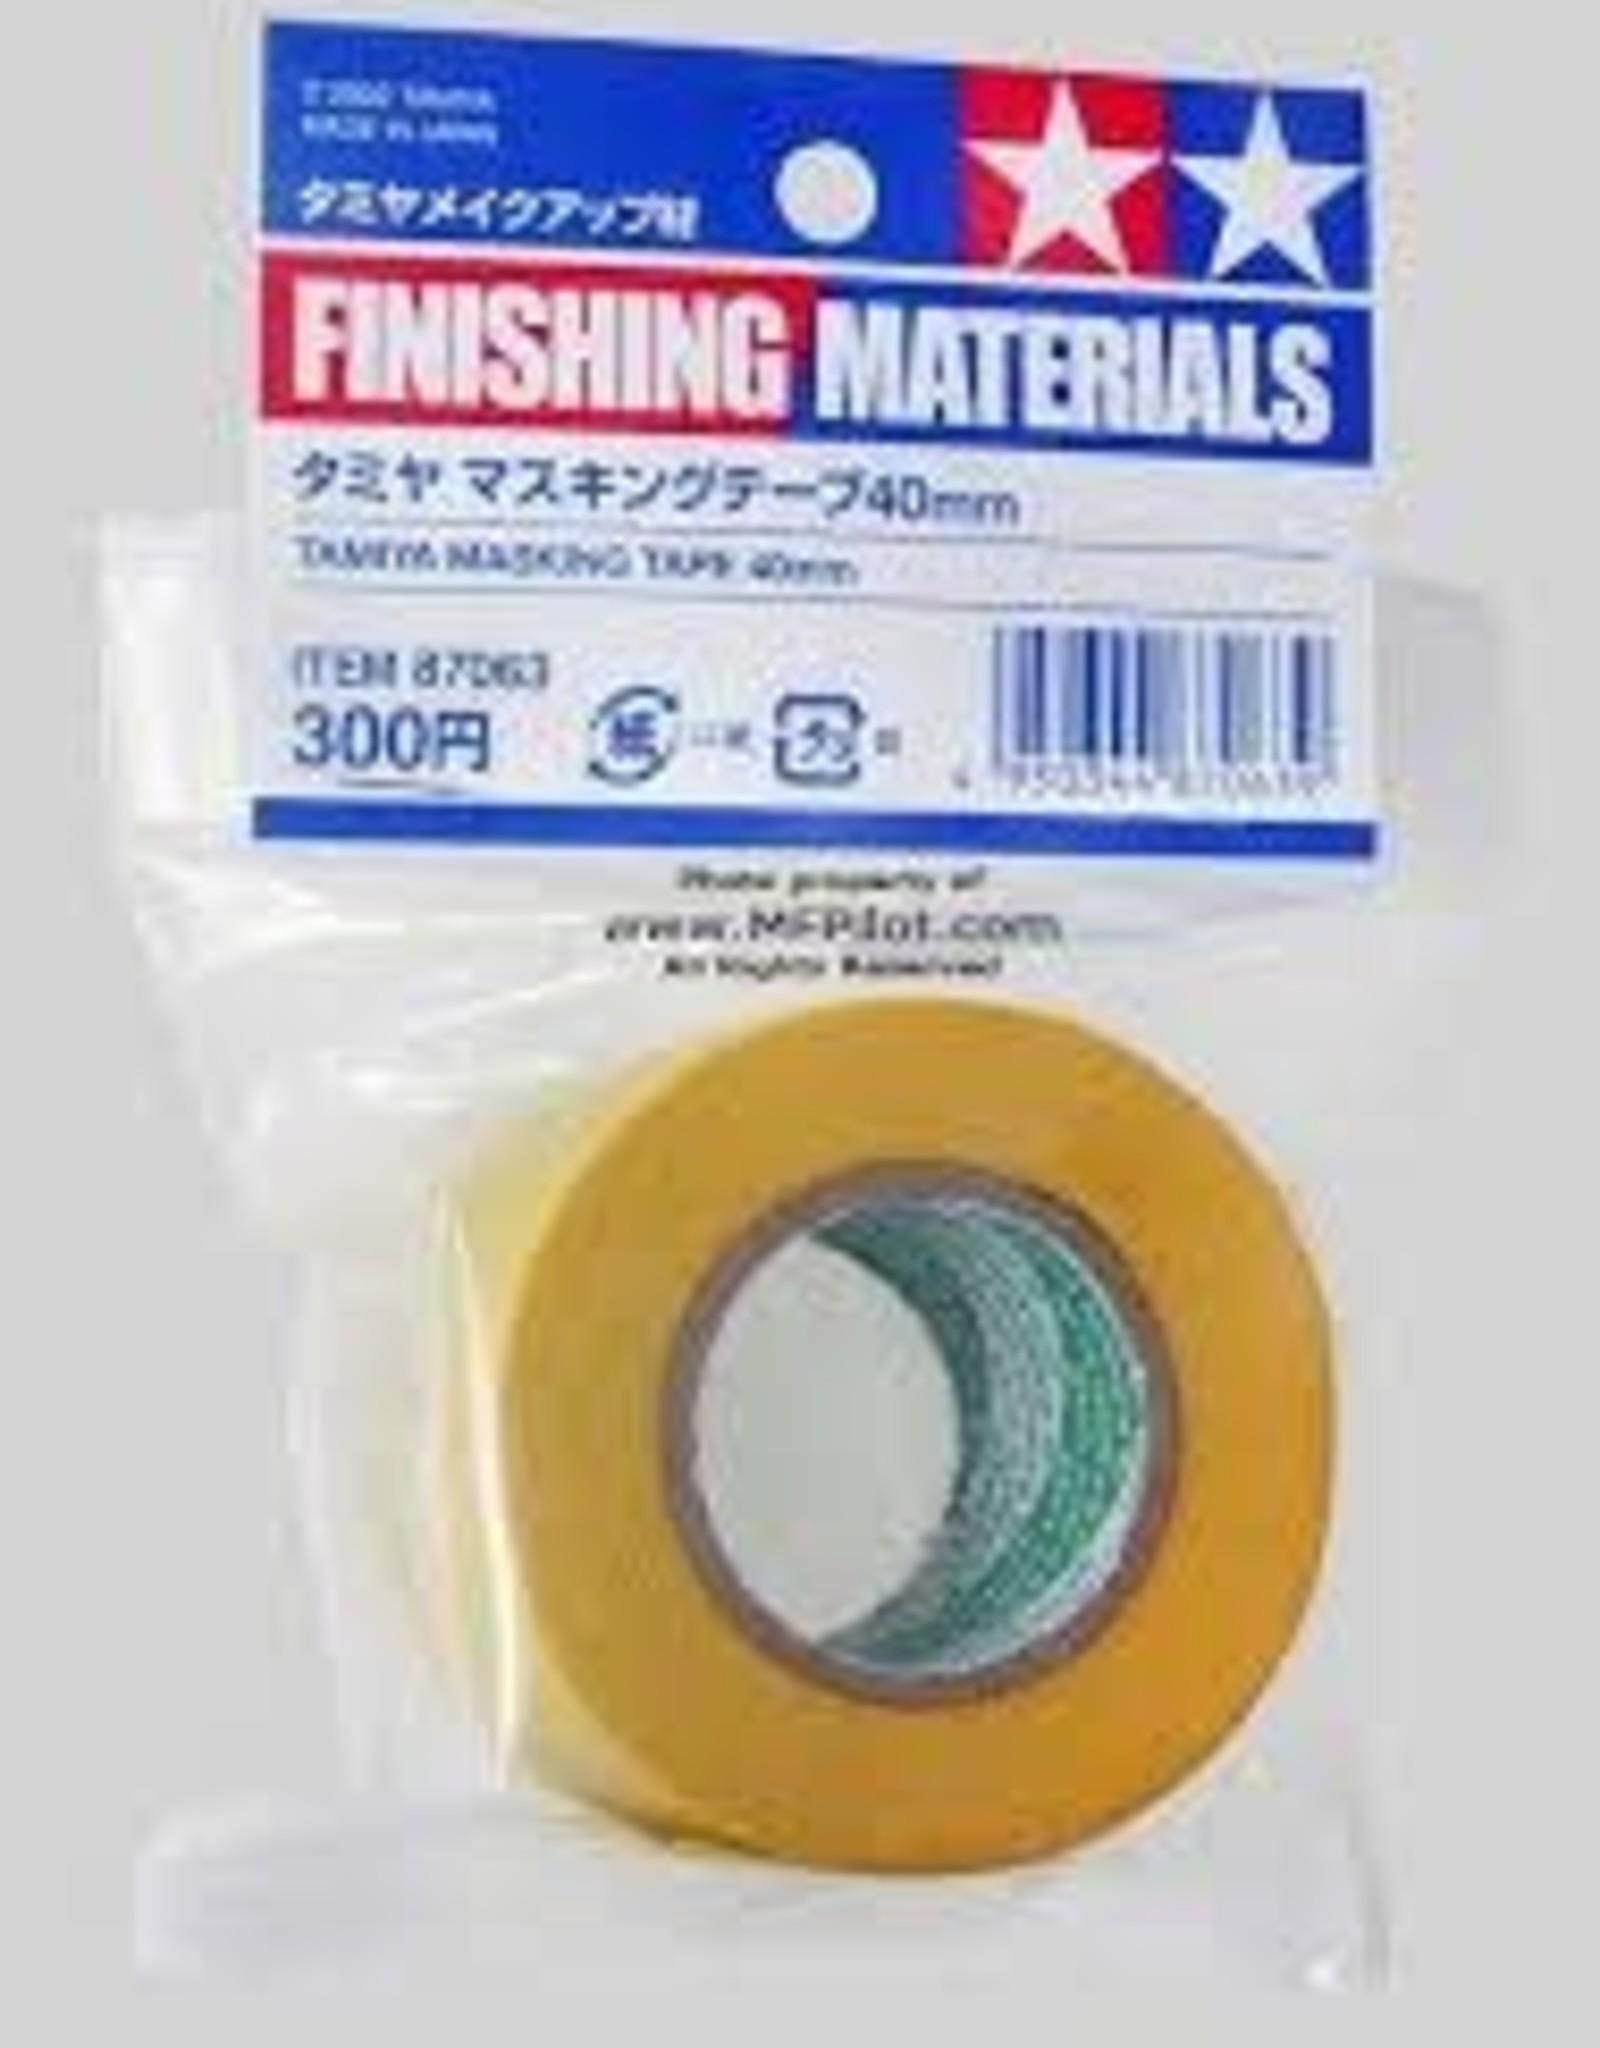 Tamiya Tamiya 40mm Masking Tape